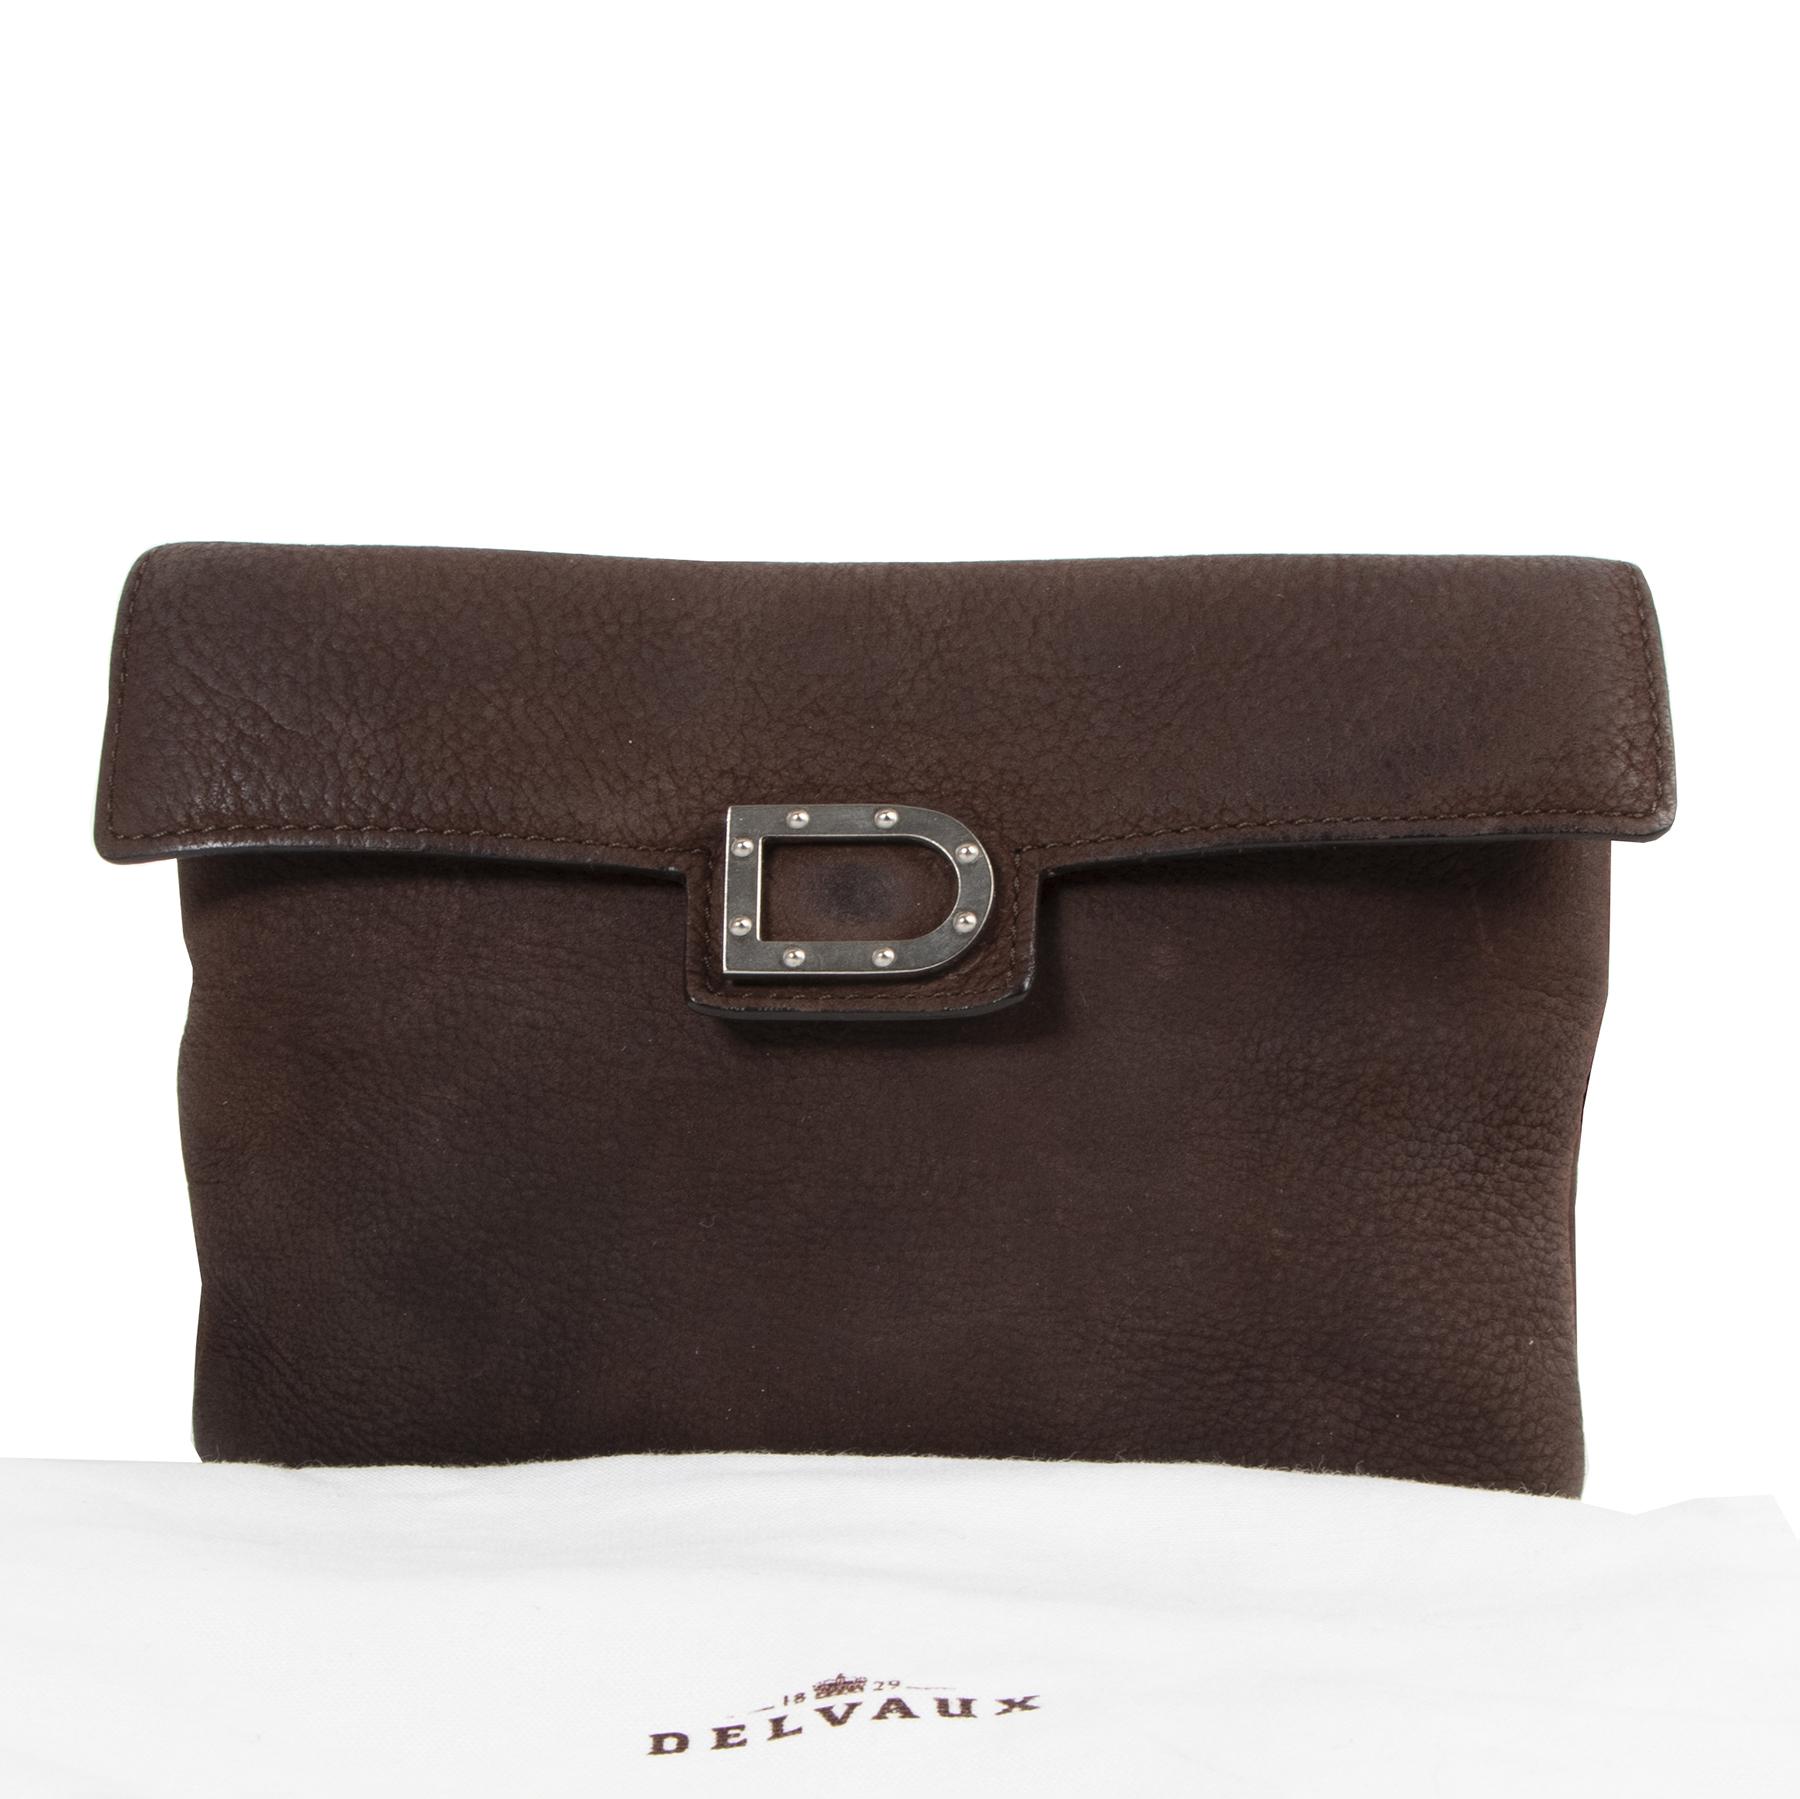 Delvaux Brown Nubuck Belt Bag